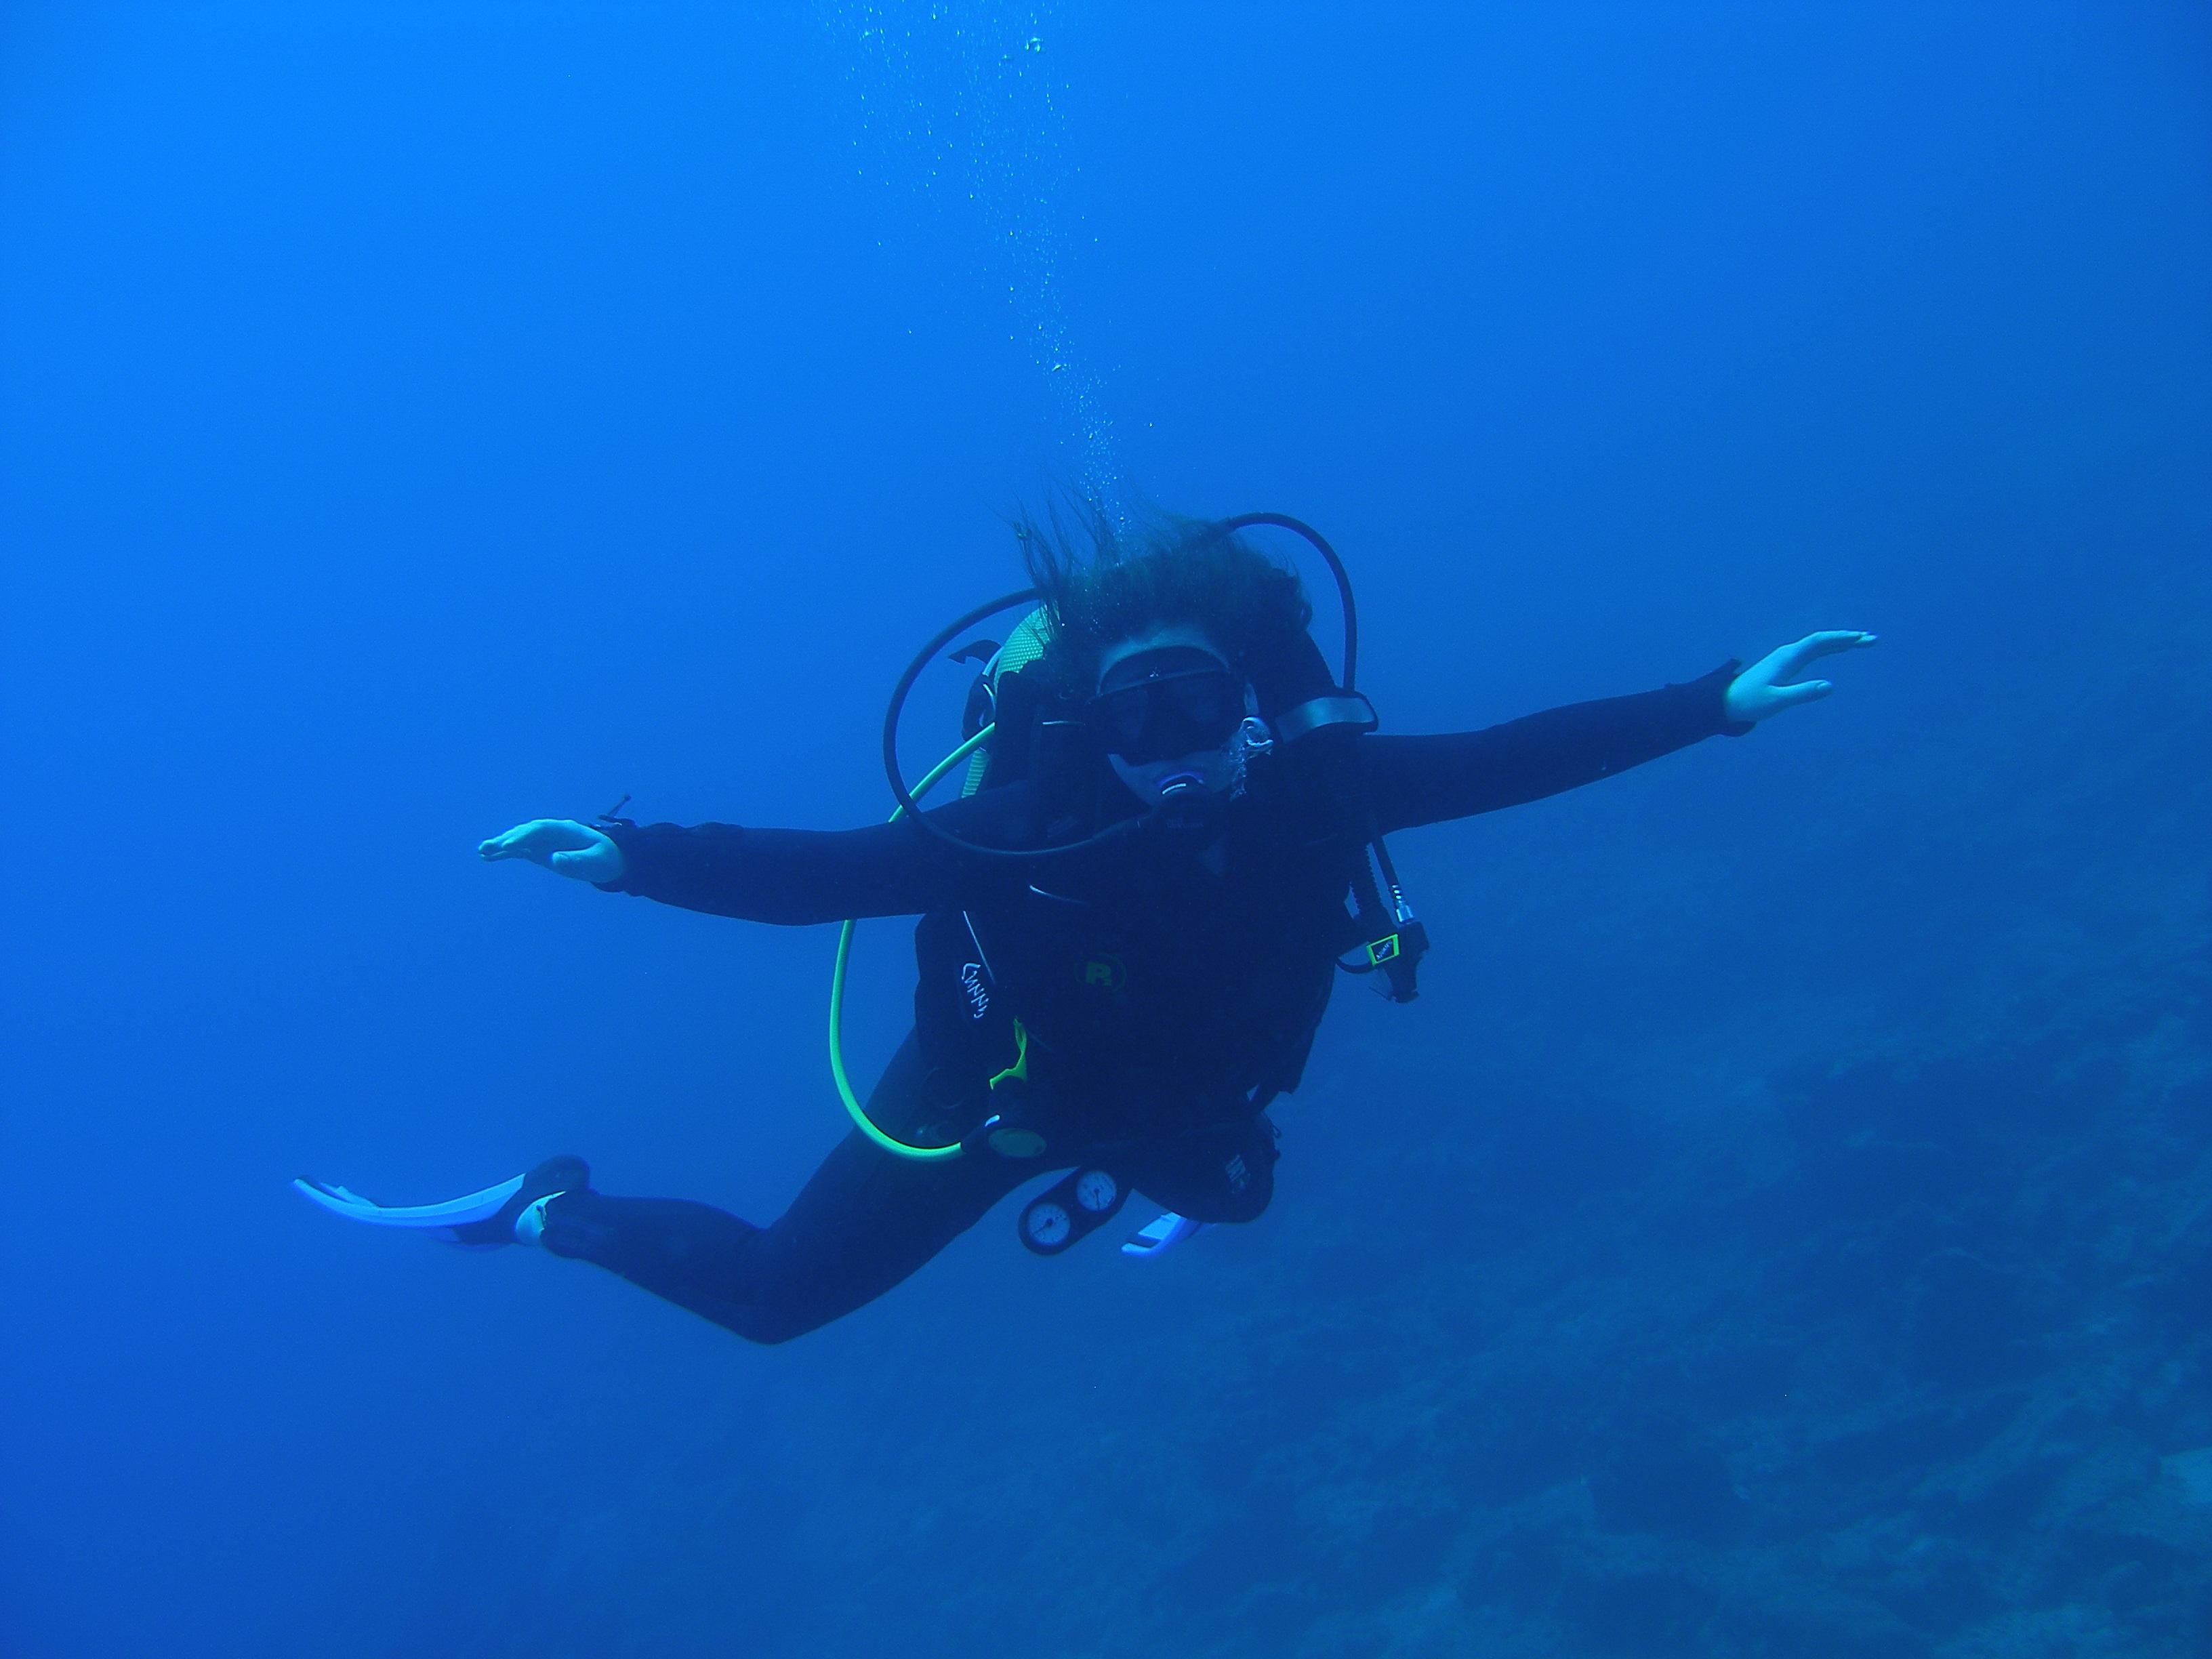 Mariliis Eensalu diving in the Mediterranean Sea.